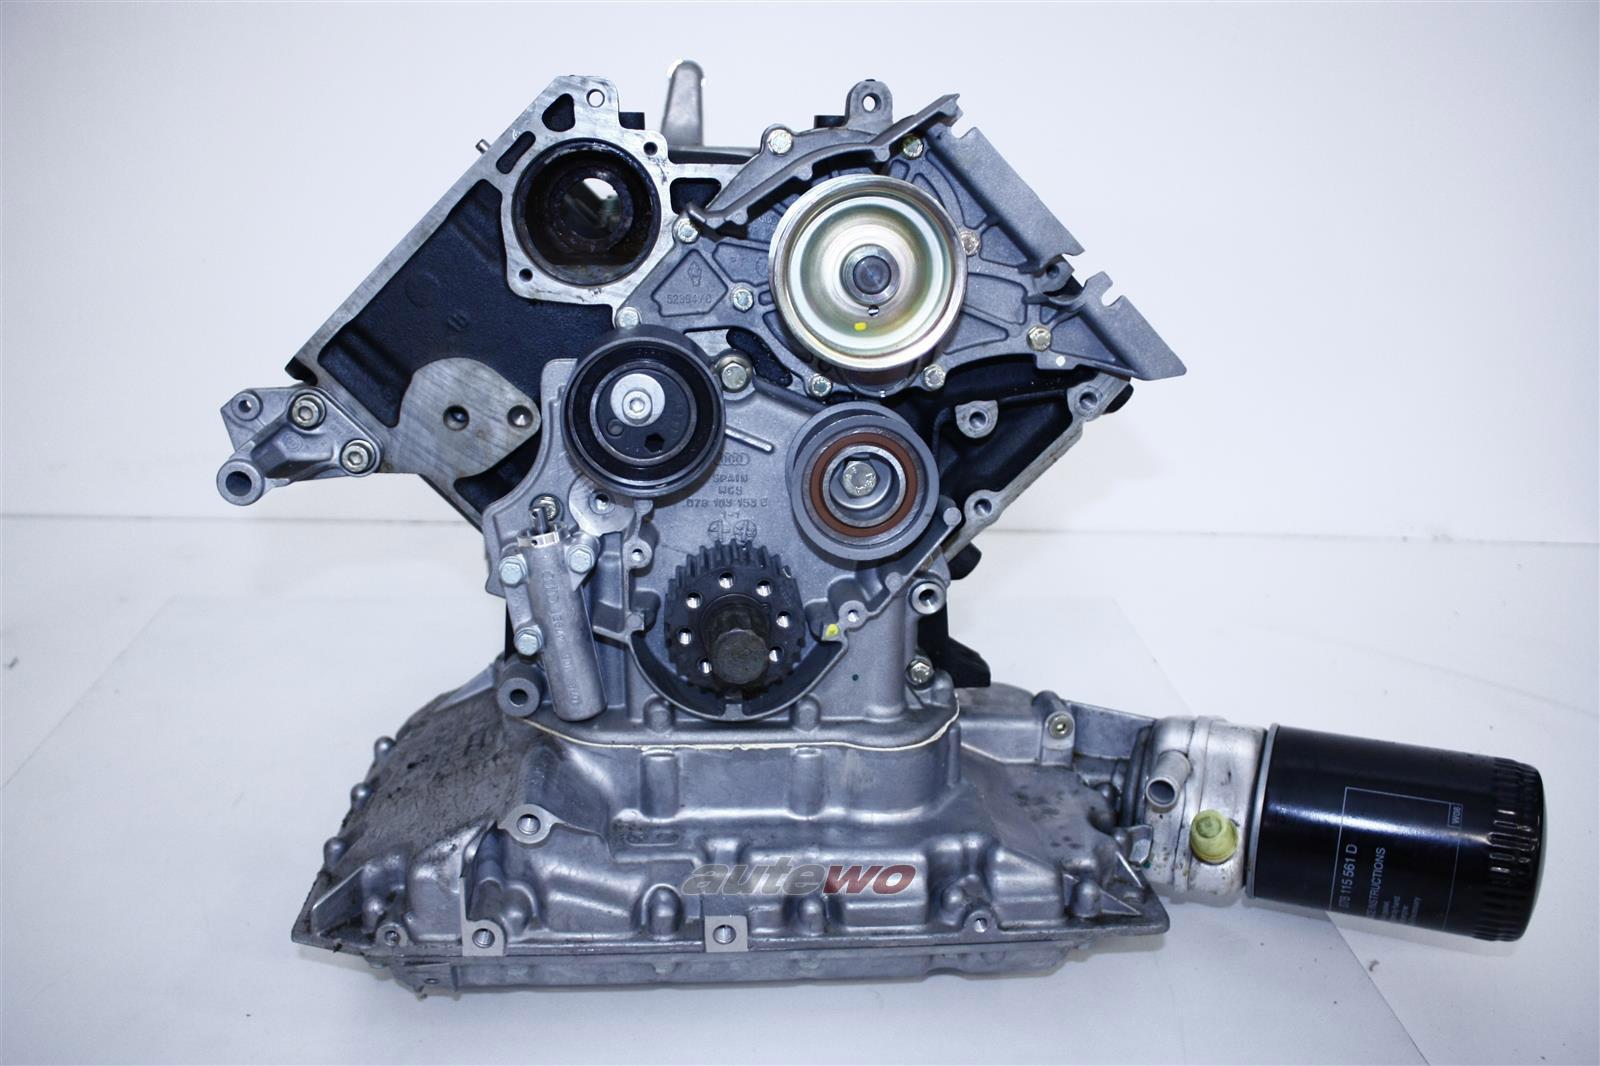 078103101BB NEU Audi A4 B5/A6 4B/A8 D2 2.8l 6 Zyl. ACK/ALG/APR/AQD Teilmotor